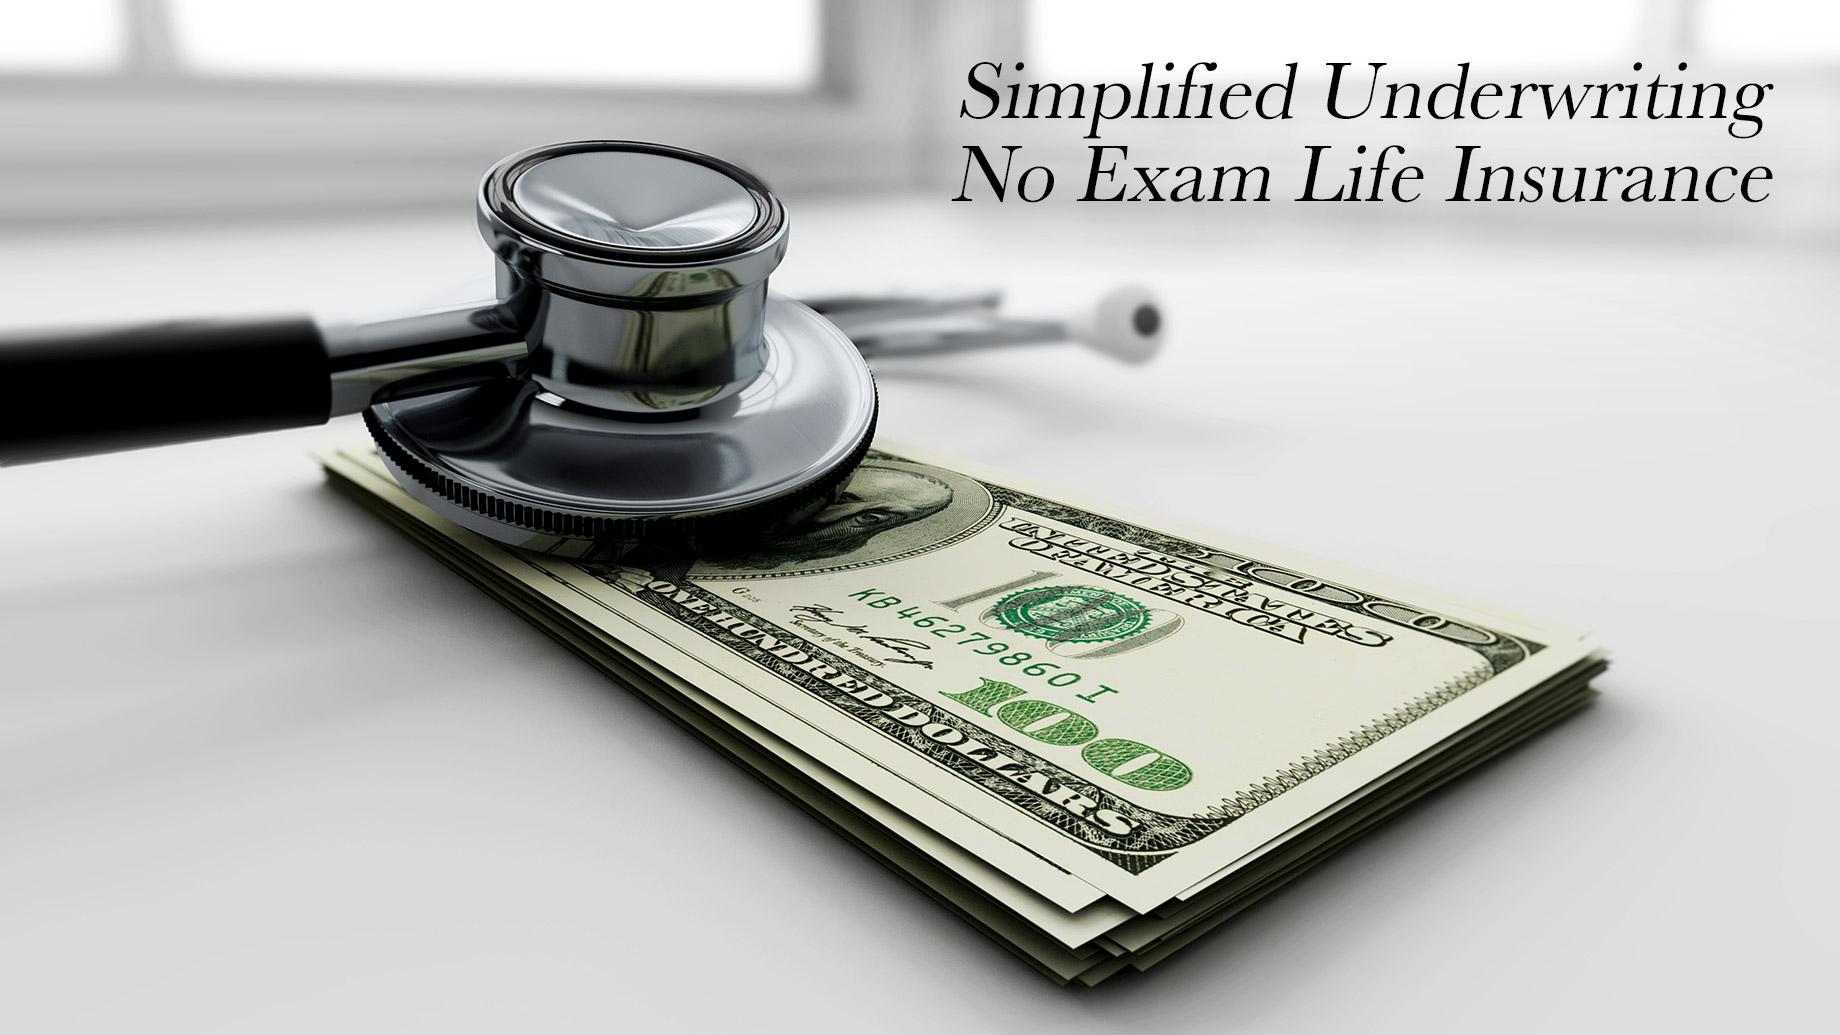 Simplified Underwriting No Exam Life Insurance